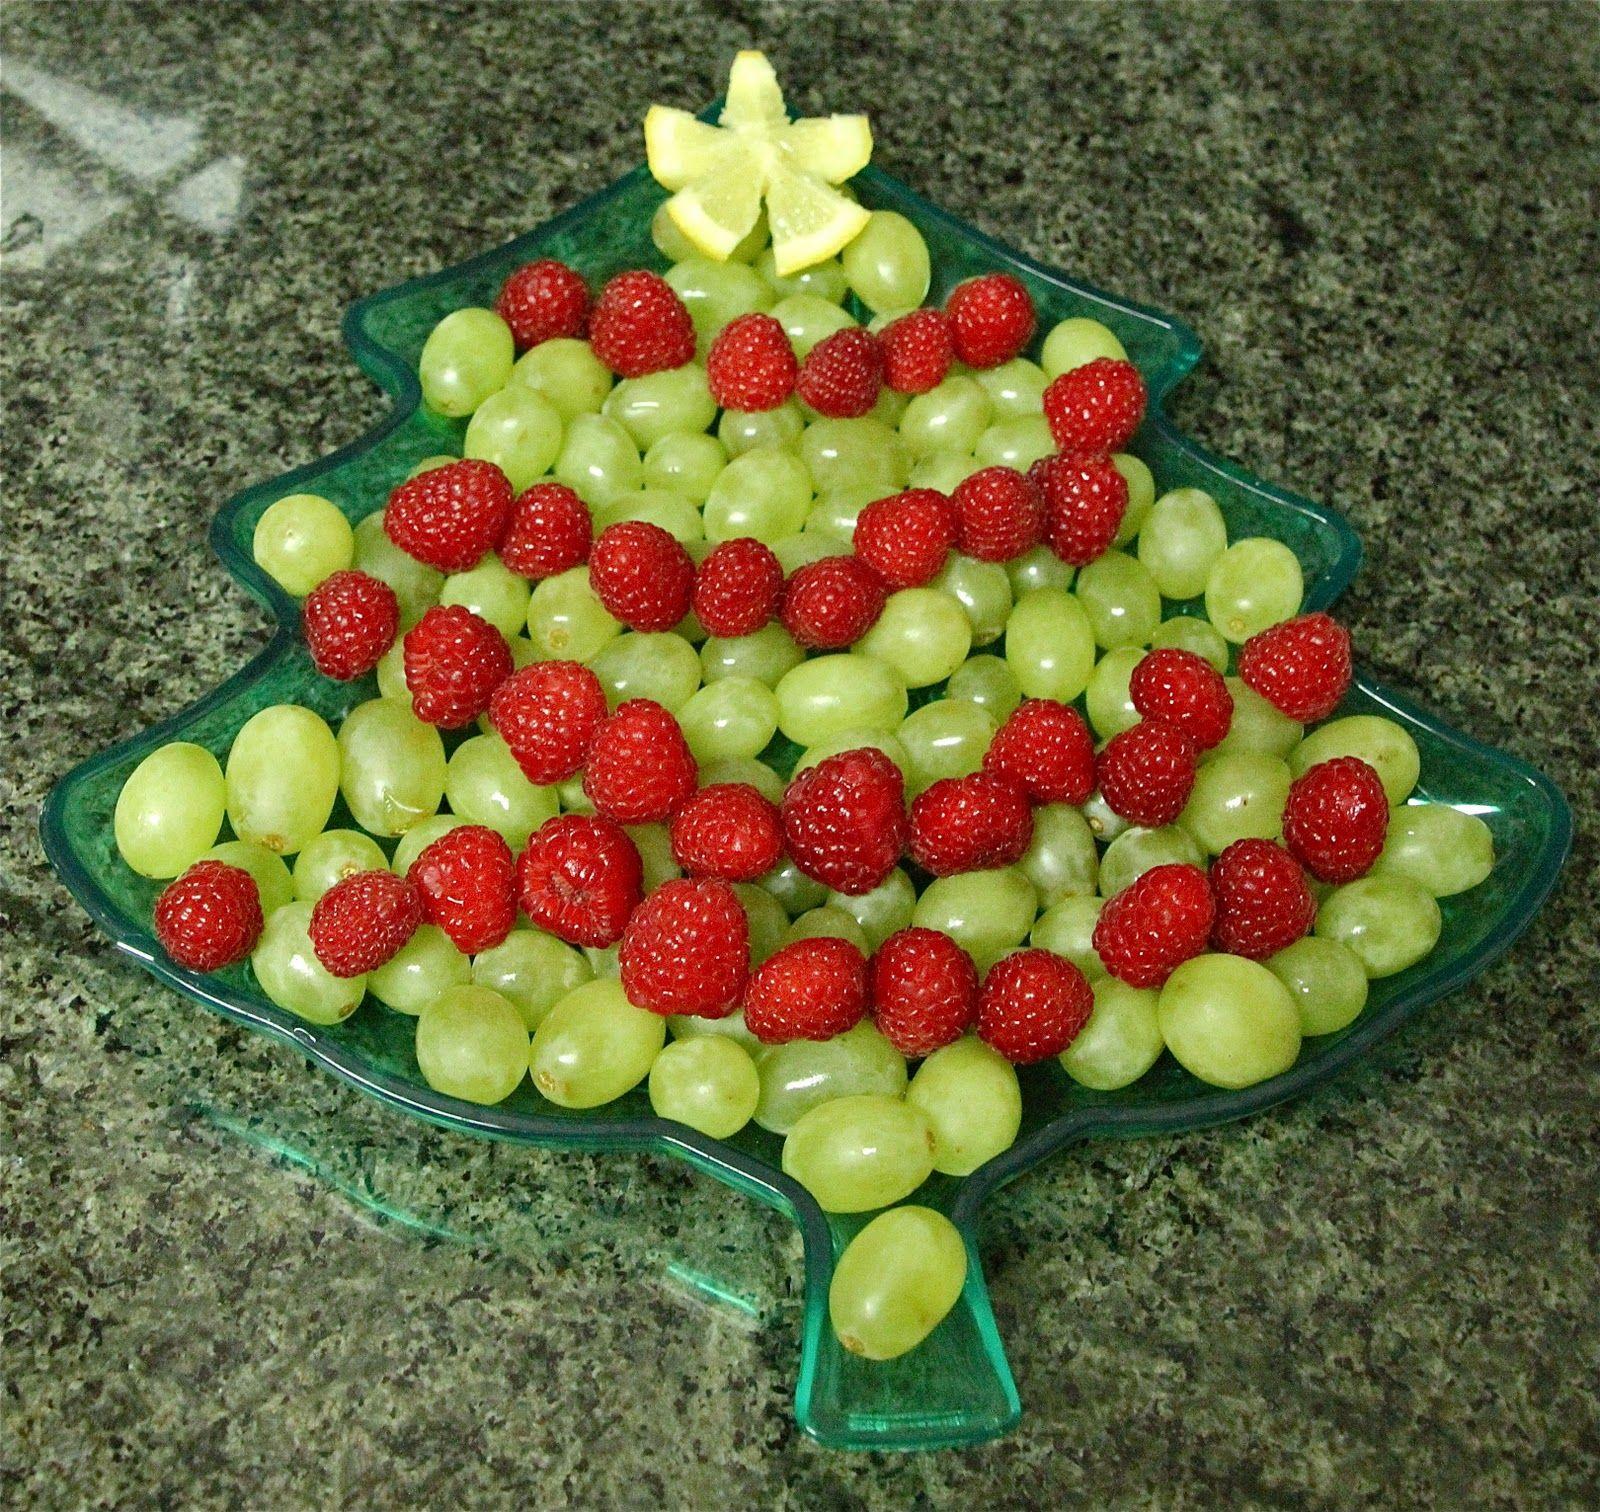 Willow of wonder new traditions christmas pinterest - Ideas para comida de navidad ...